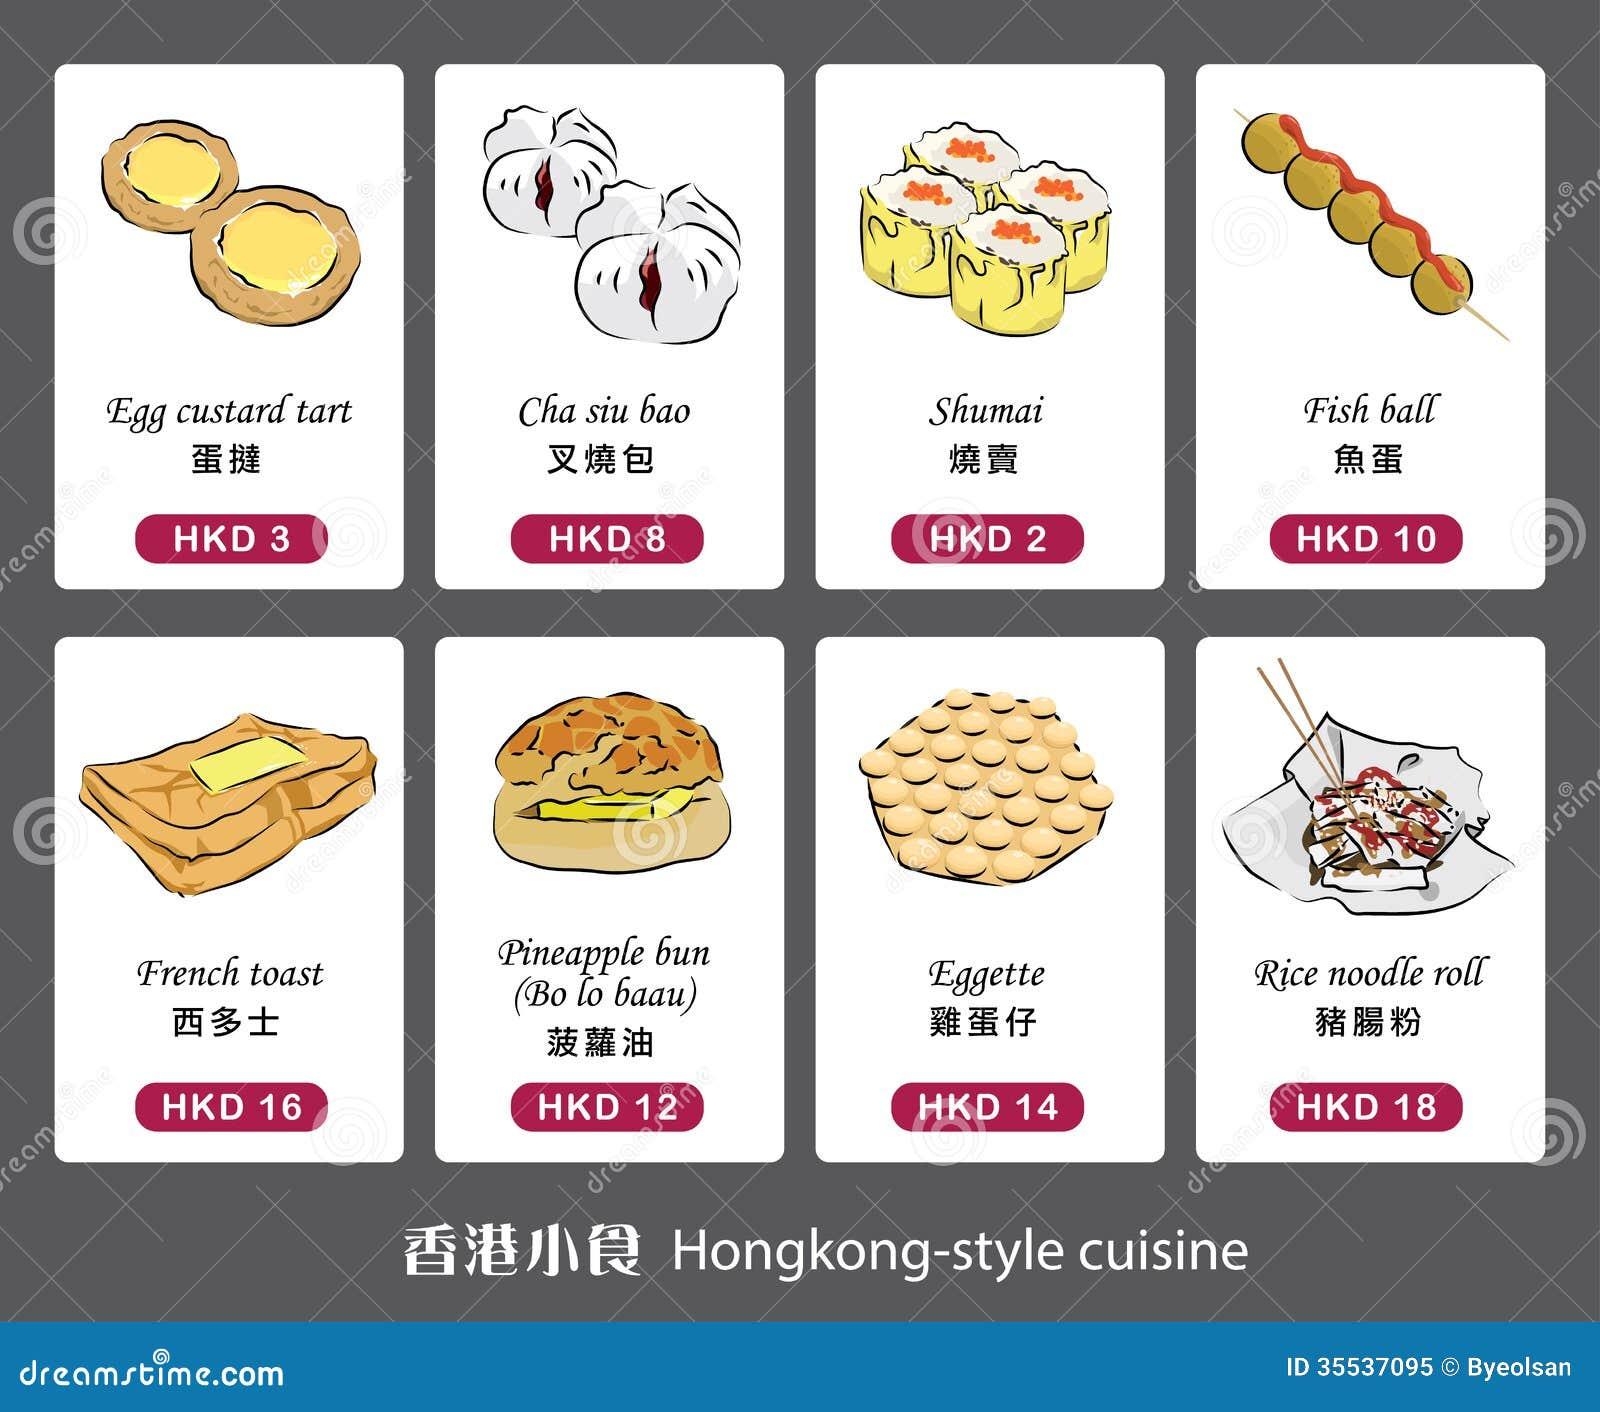 Wektorowa grafika styl kuchnia